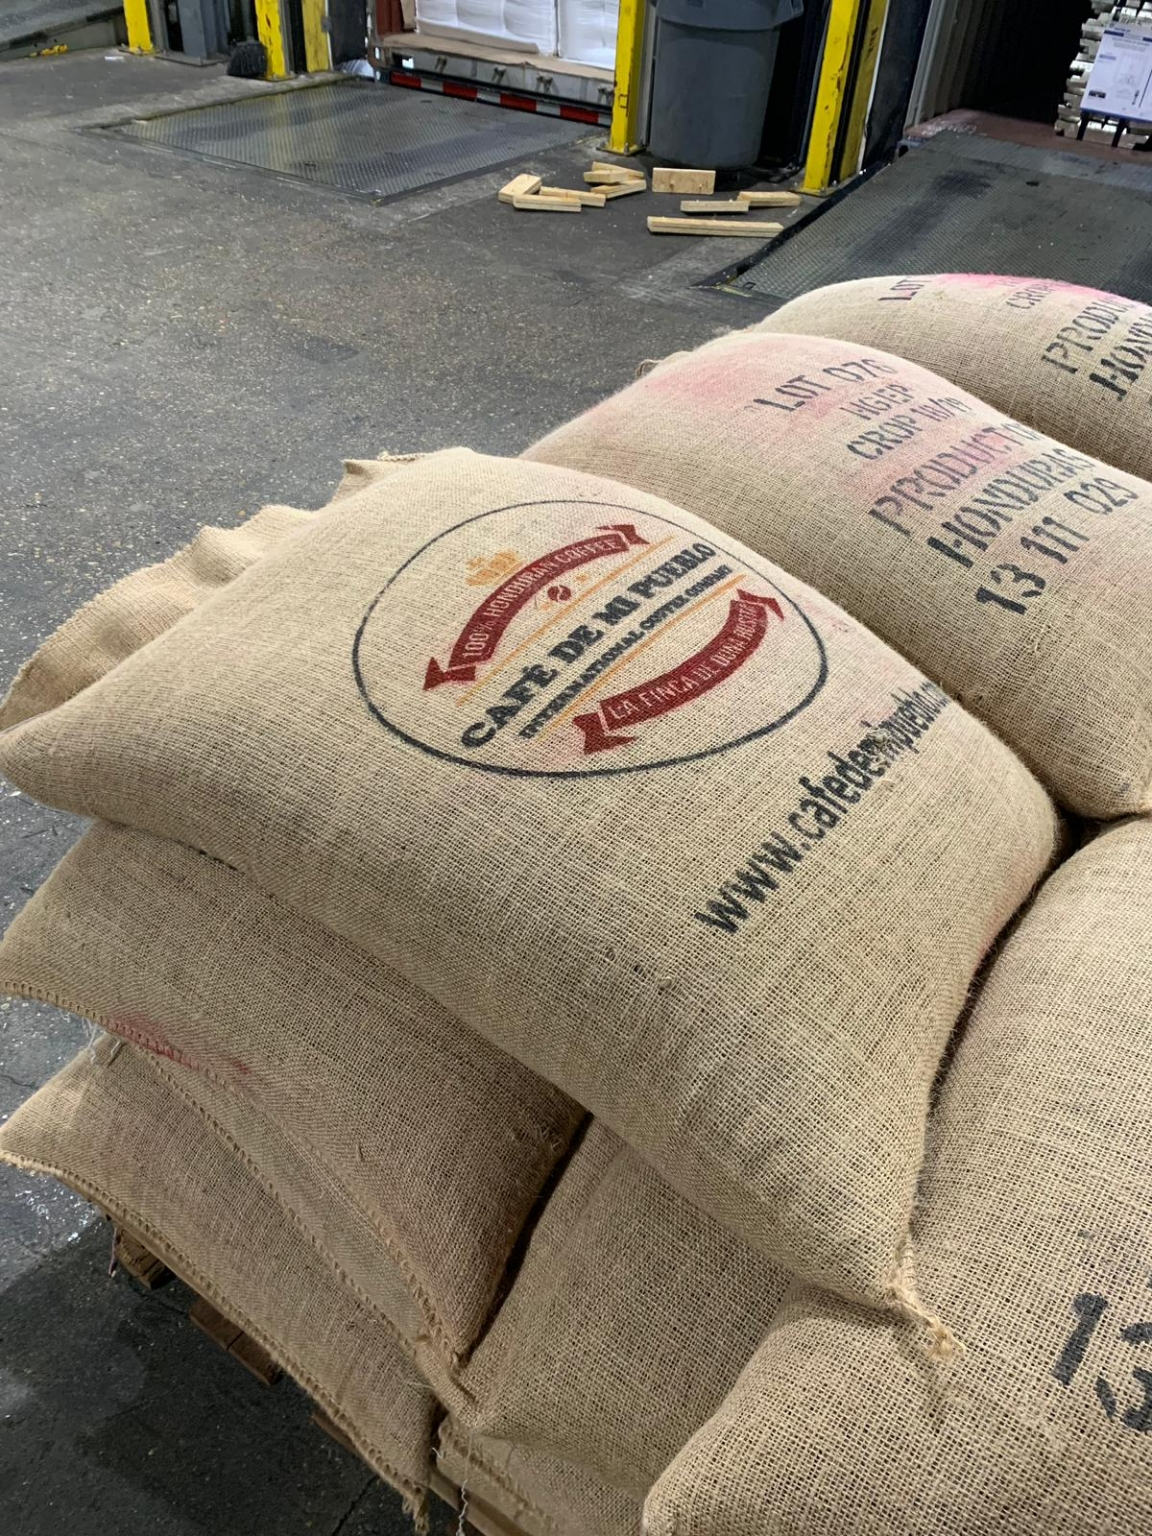 69-kilo coffee bags